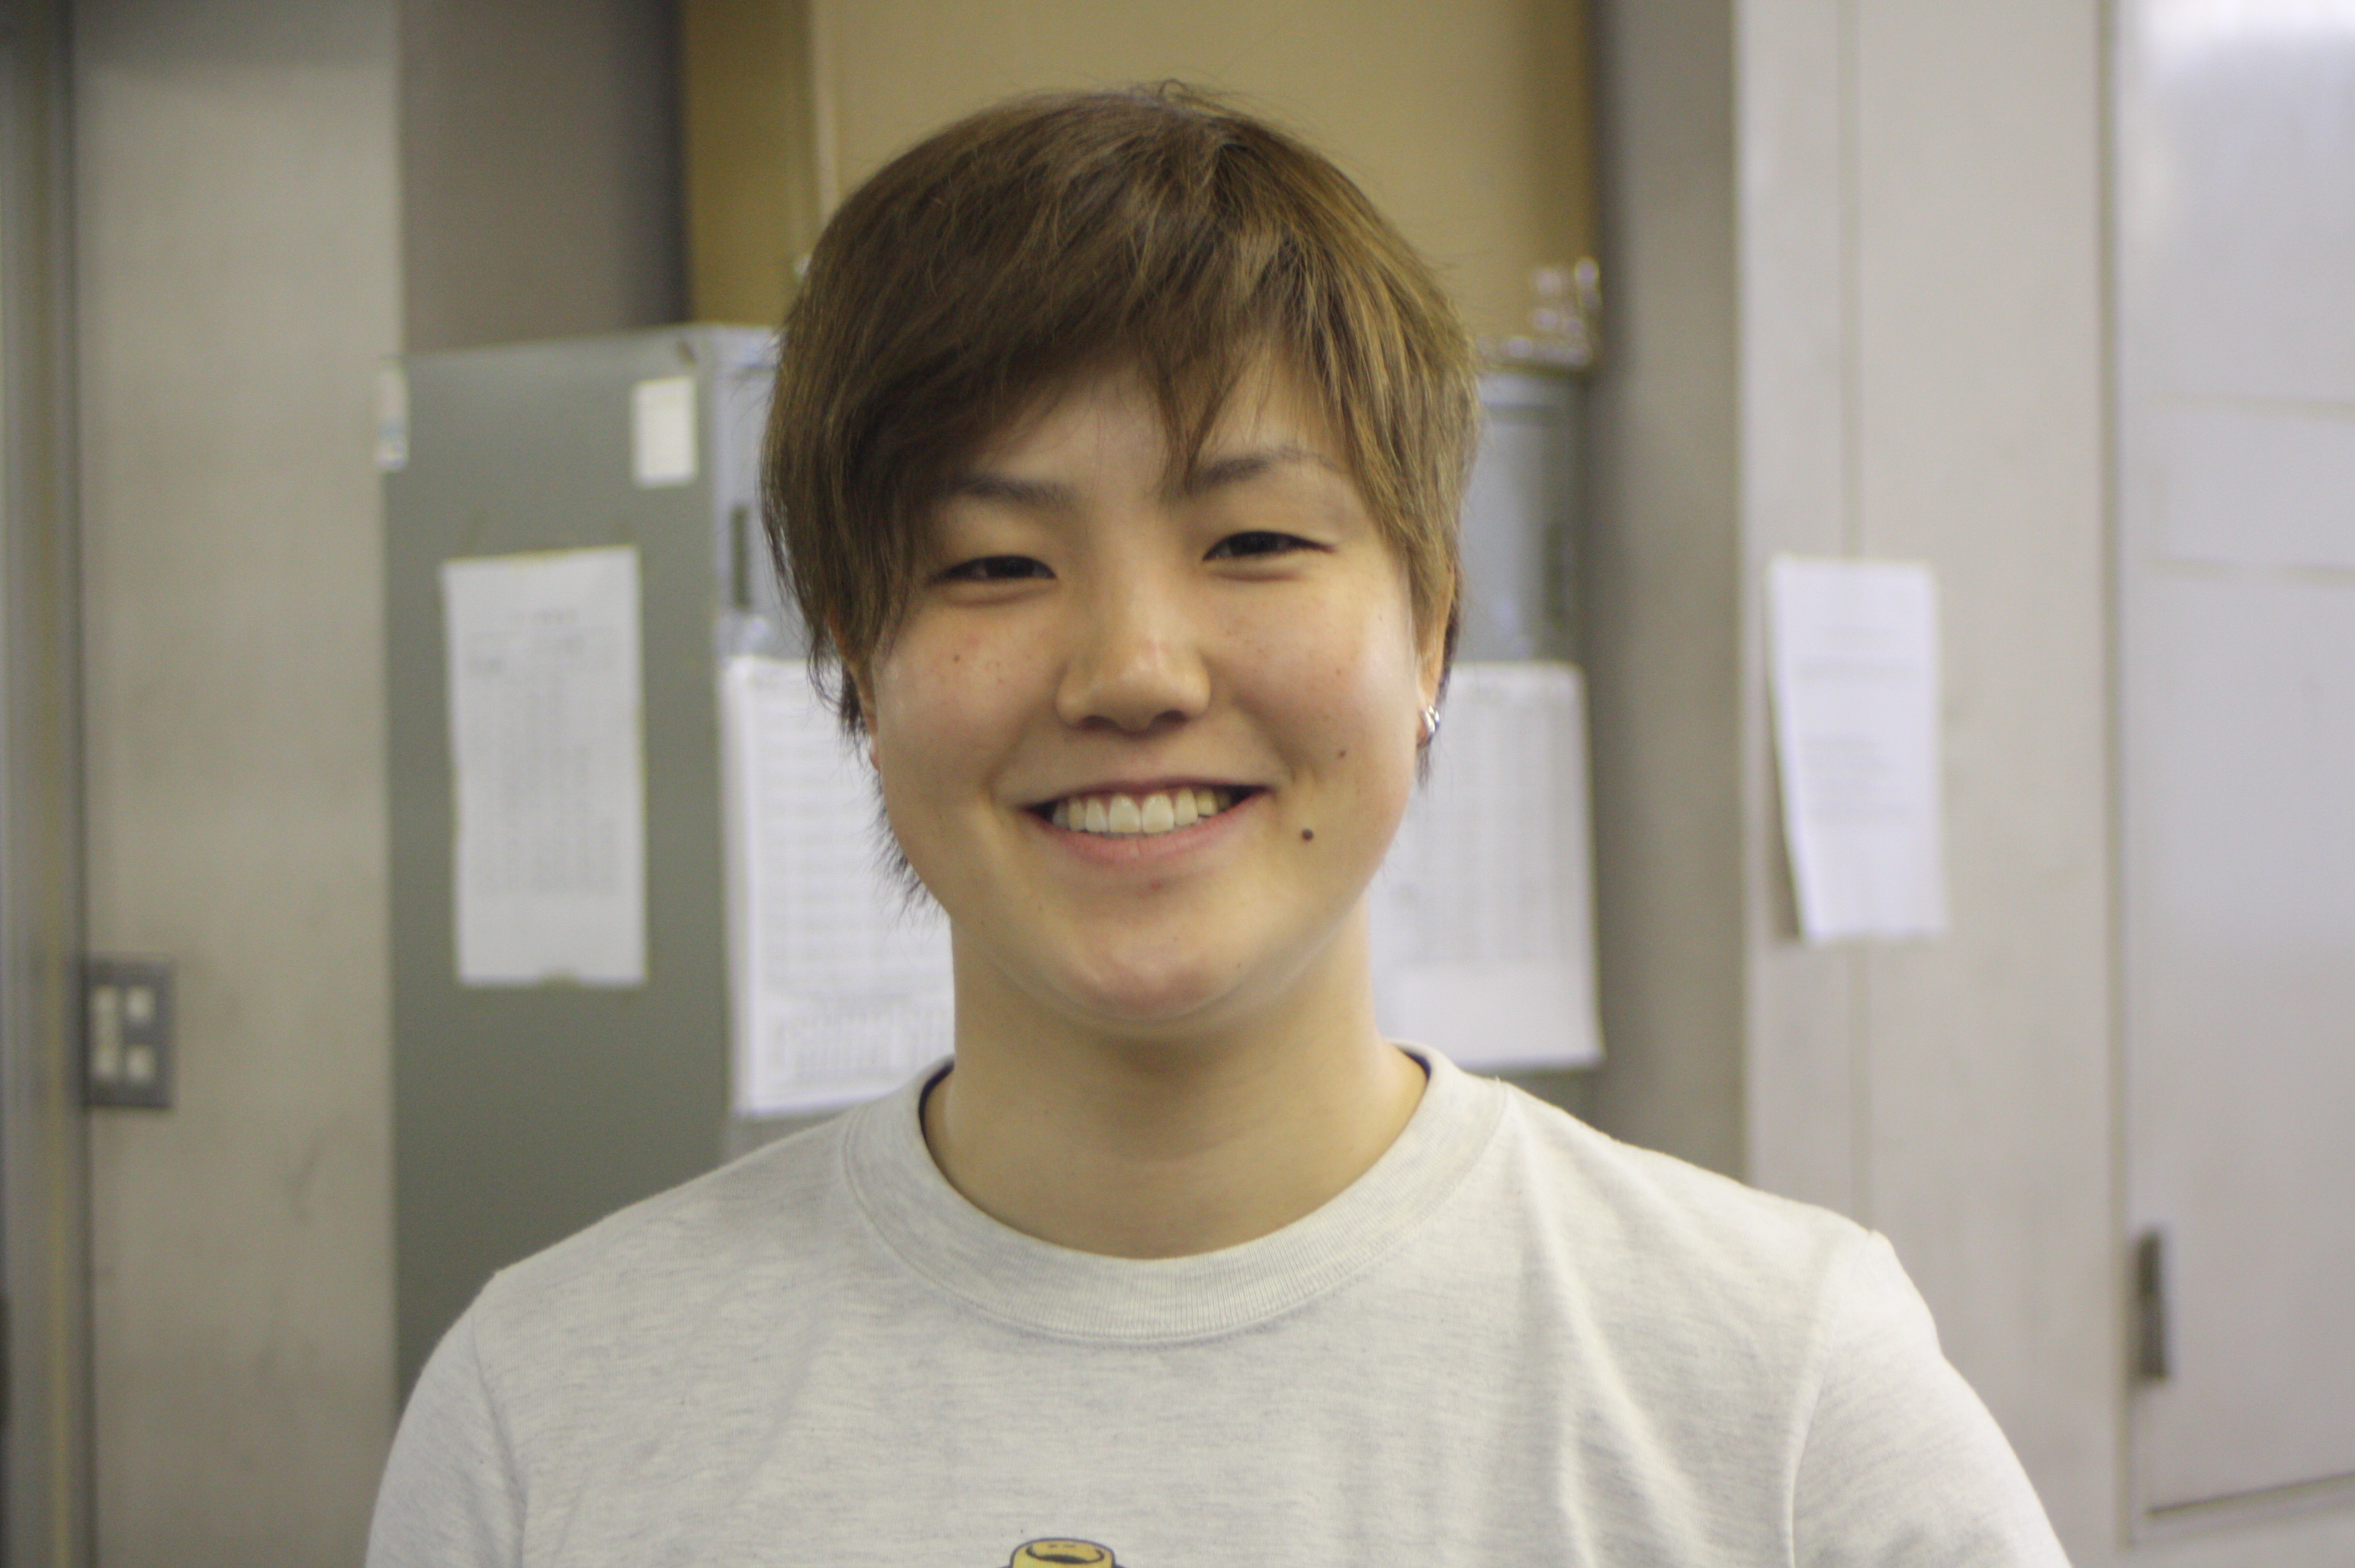 https://www.keirin-saitama.jp/omiya/wp-content/uploads/archives/%E5%B0%8F%E6%9E%97.JPG